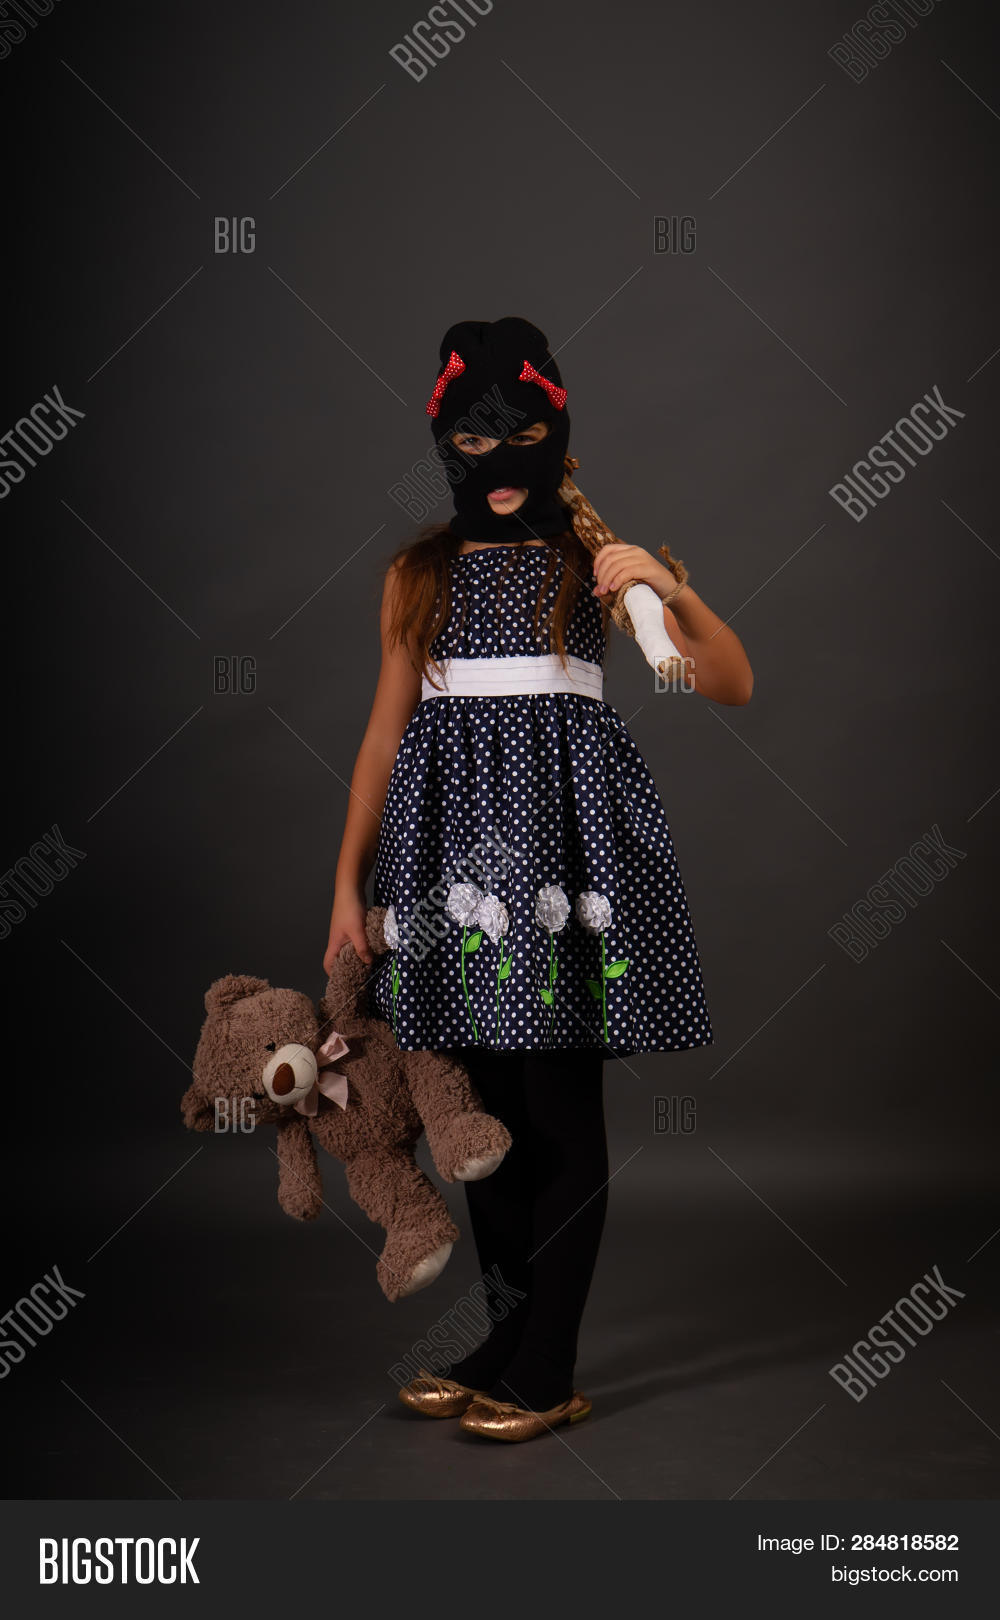 225fead05c826 One Teenage Girl Hooligans In Bright Smart Dress